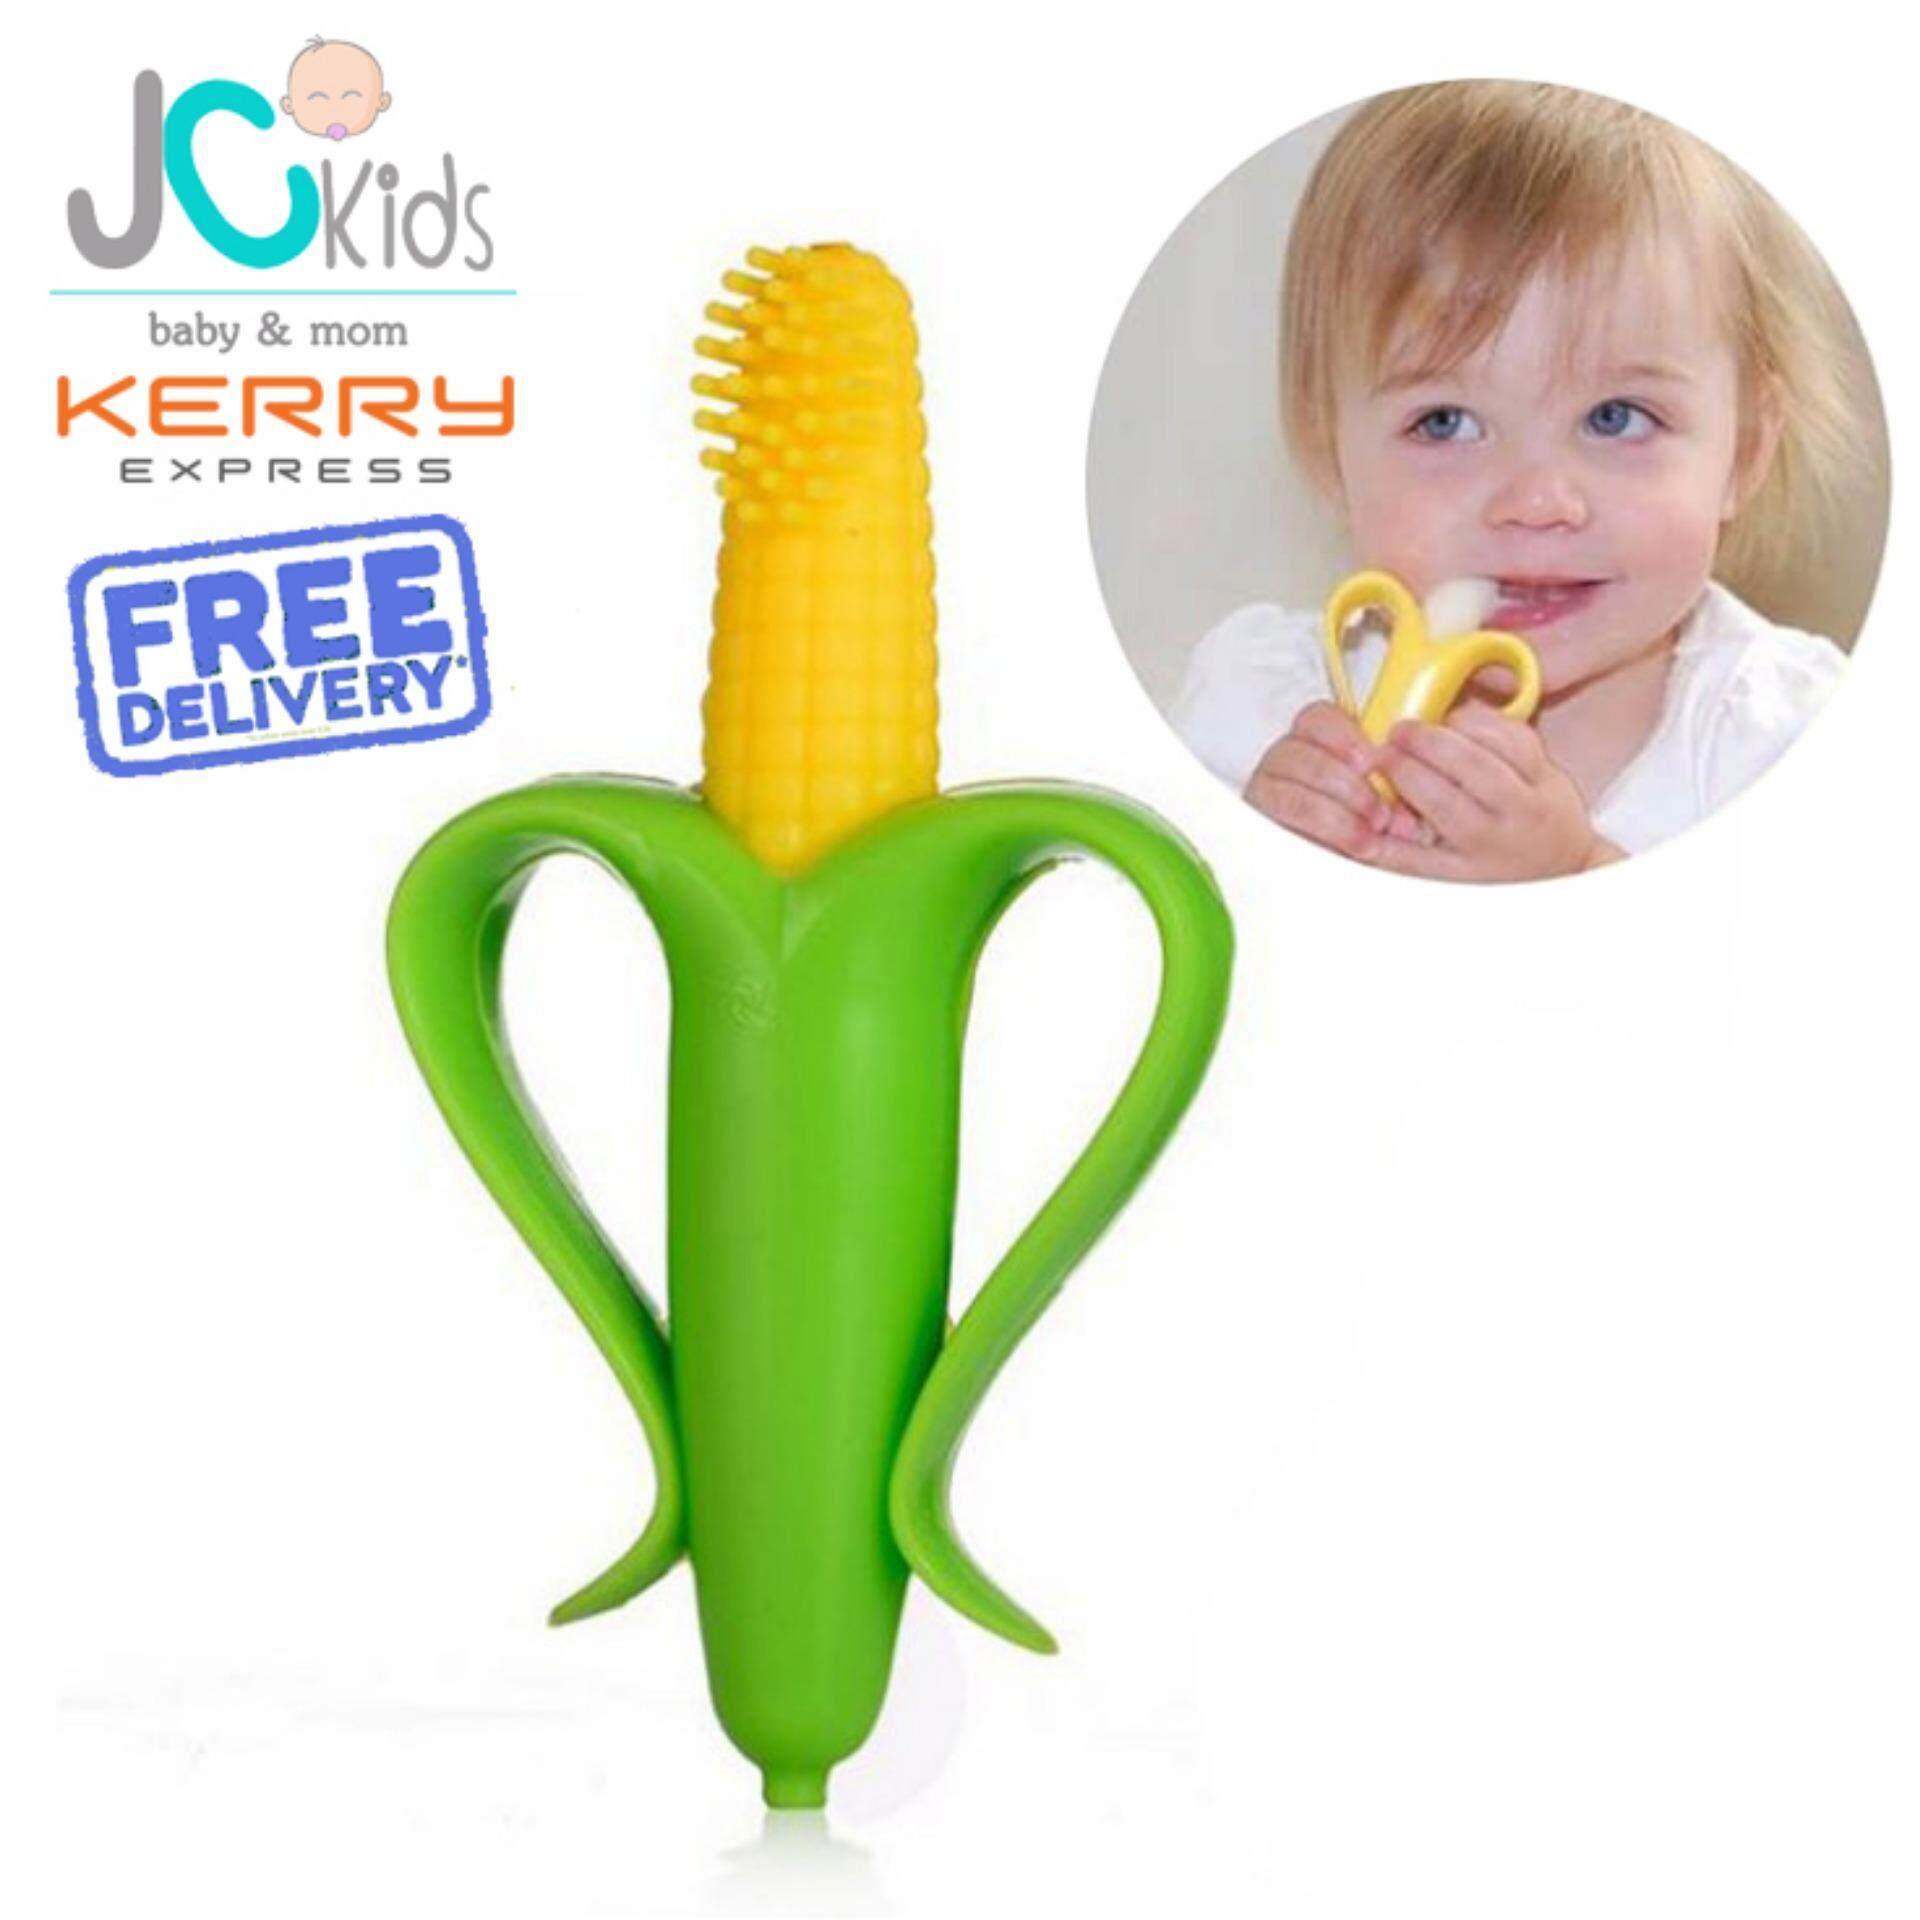 Baby Banana Brush Teether / Toothbrush แปรงกล้วย ยางกัดกล้วยสำหรับเด็กอ่อน.